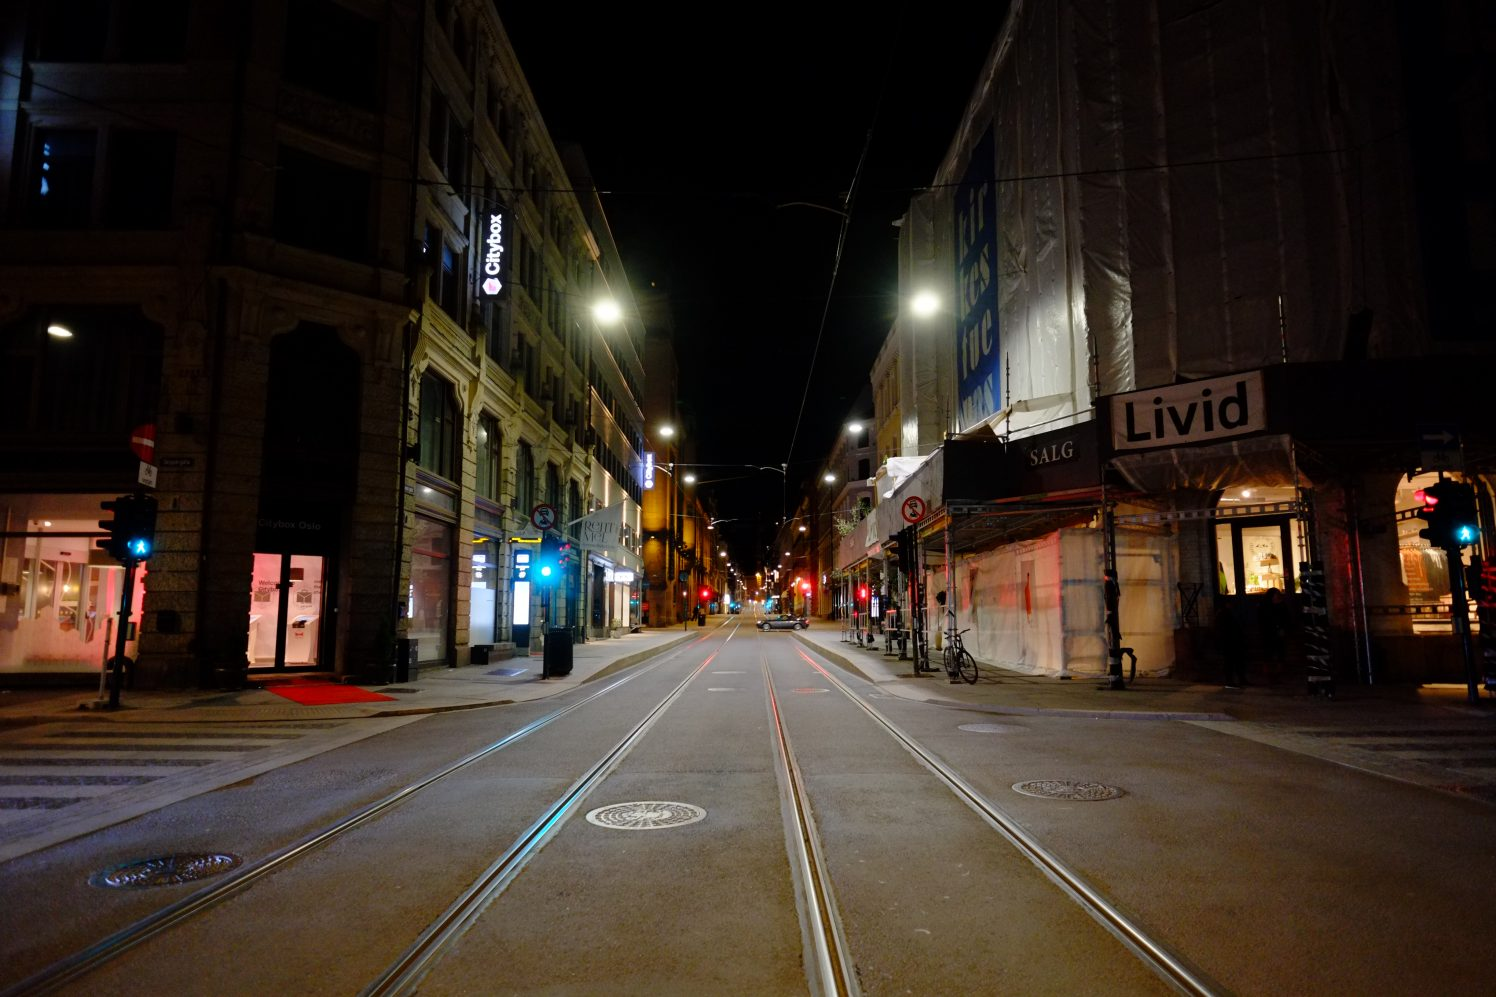 Les rues d'Oslo la nuit